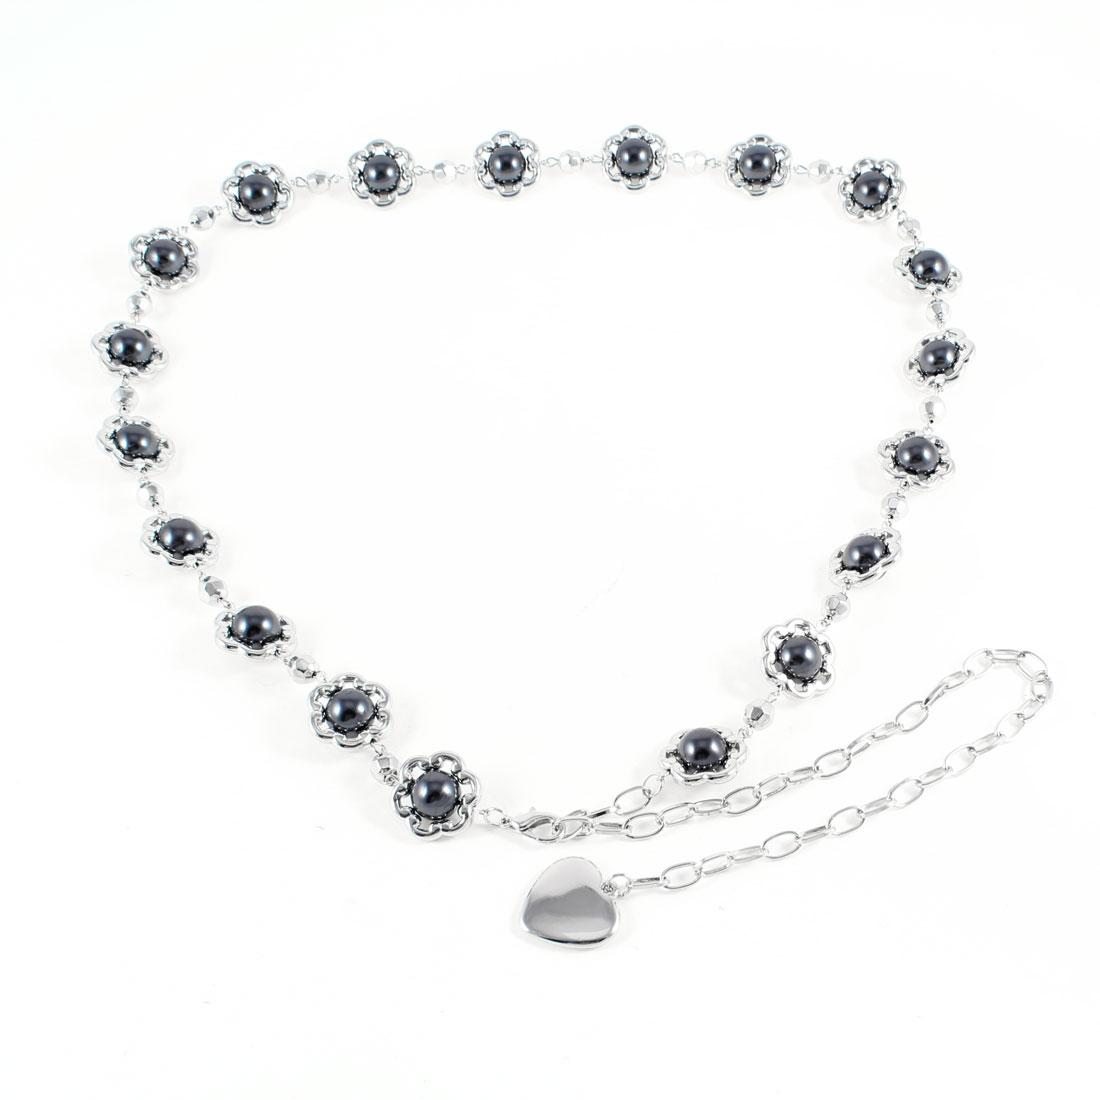 Lobster Clasp Plastic Round Beads Decor Metal Waist Belt Dark Gray for Women